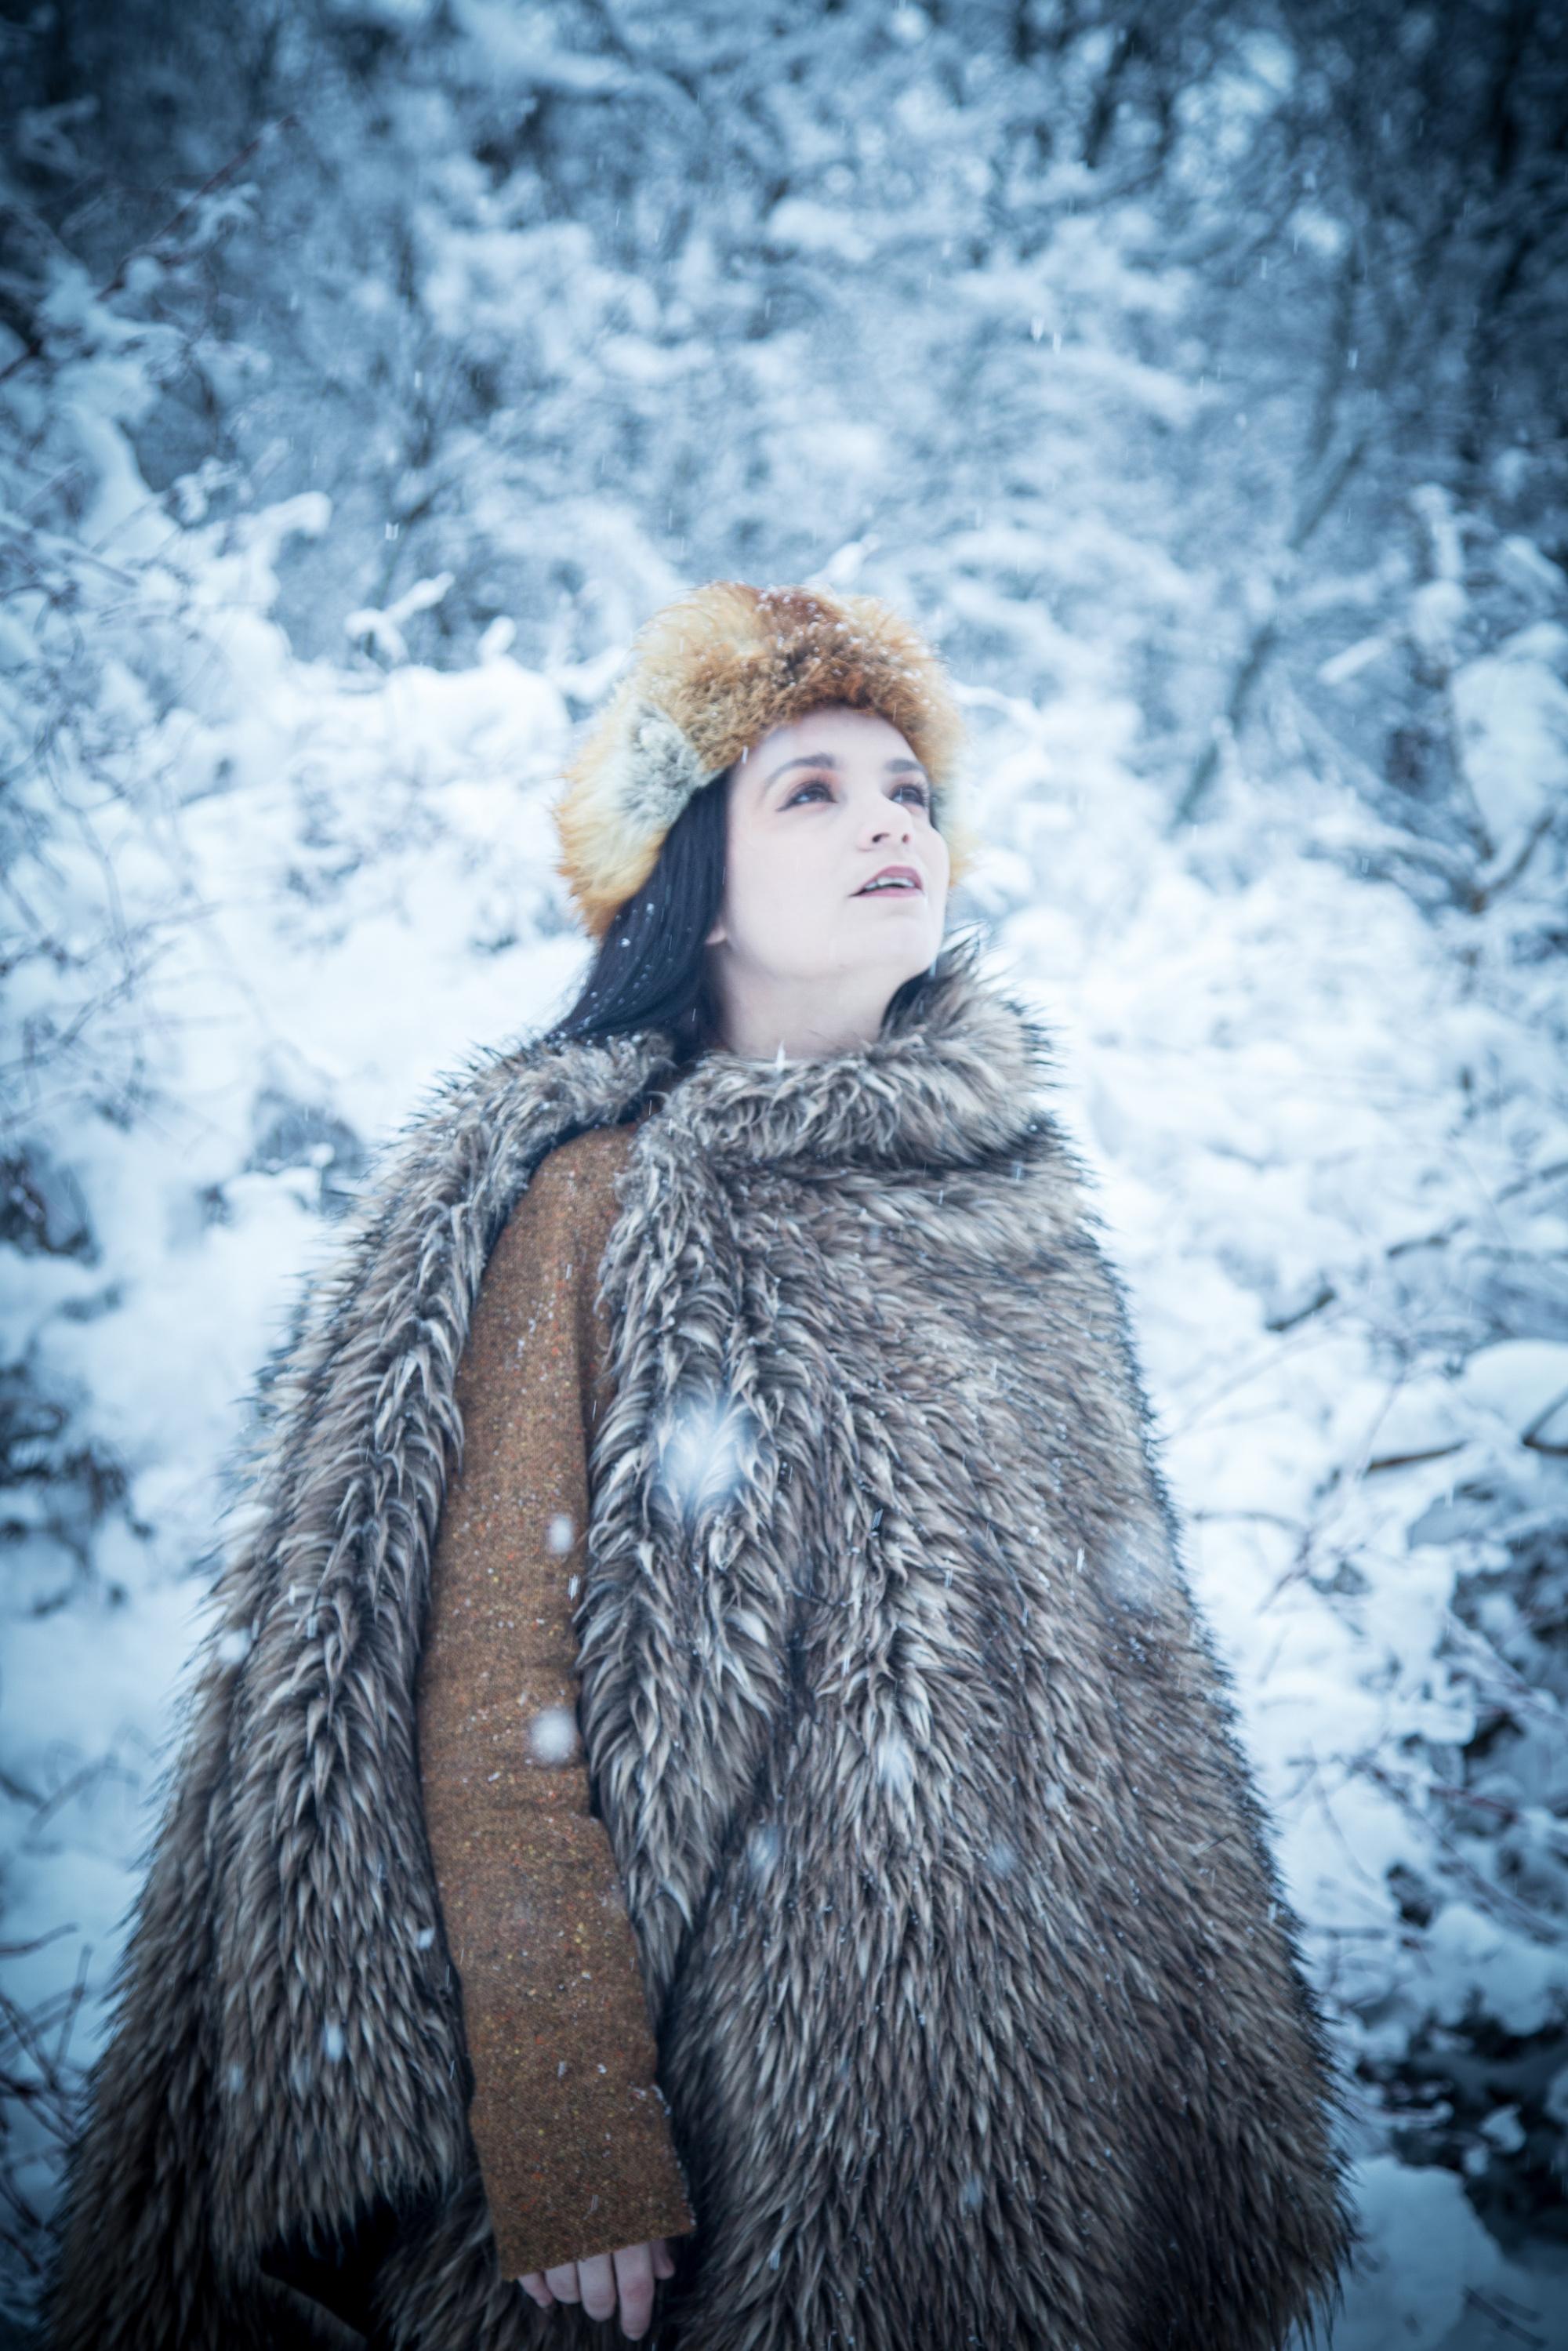 Lenka - Blue Winter, Coat, Cold, Fur, Girl, HQ Photo